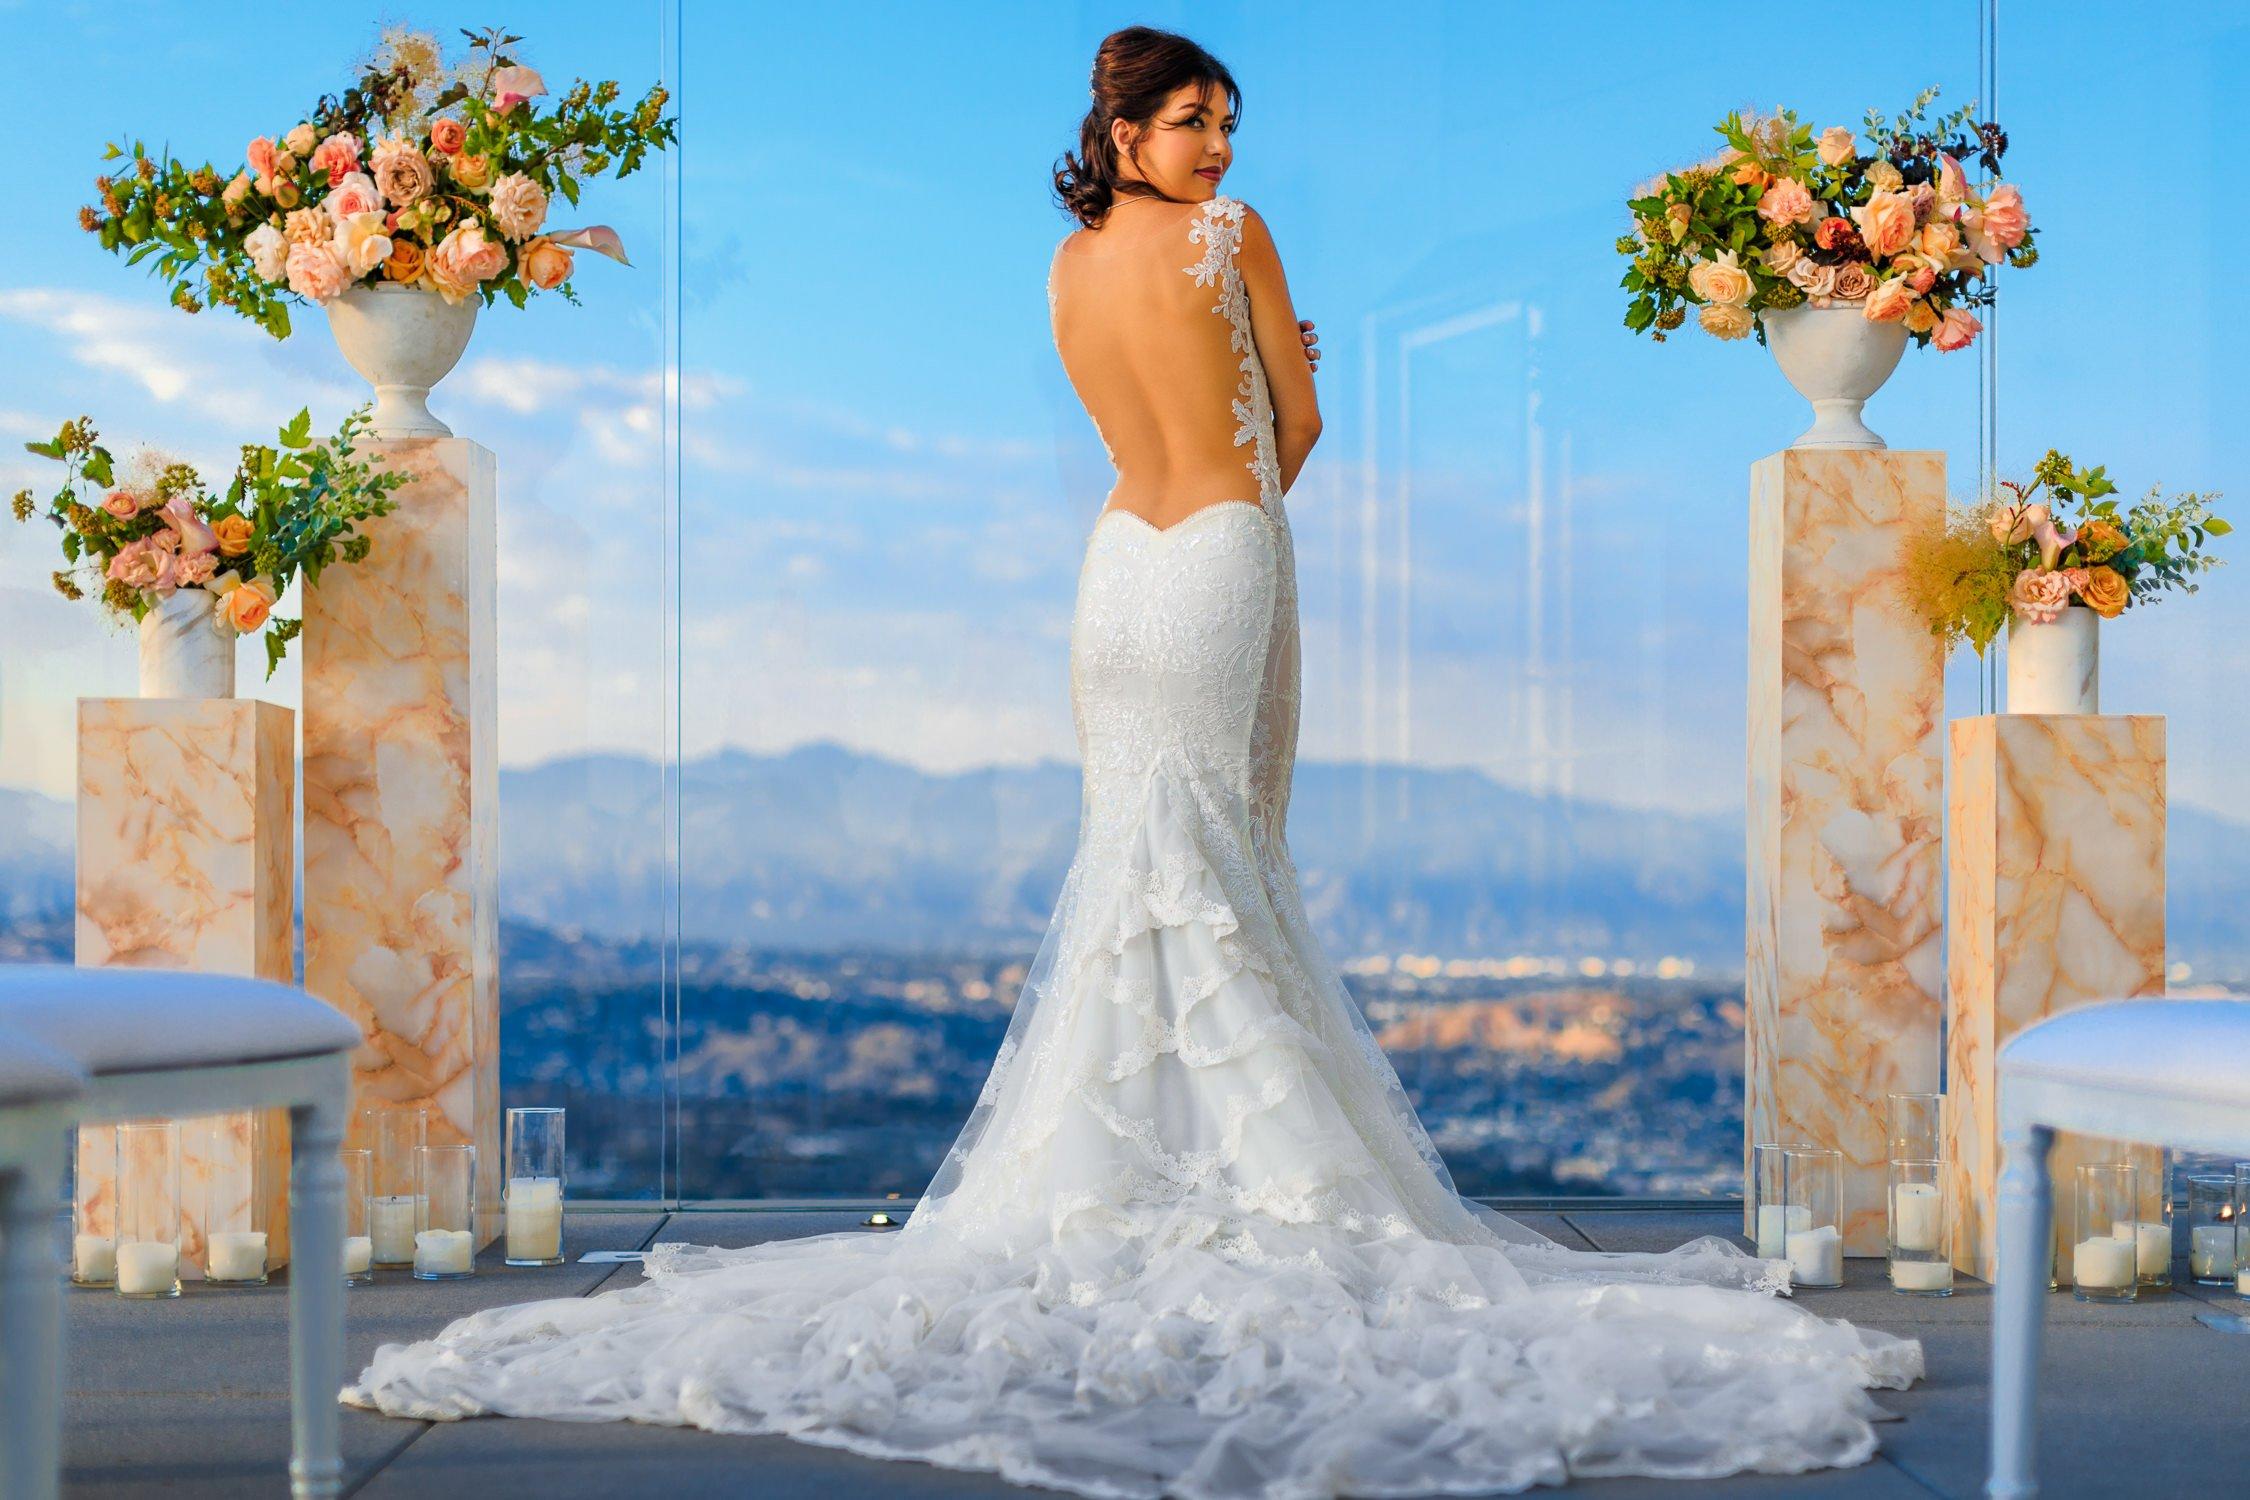 OUE Skyspace Wedding DTLA | Los Angeles Photographer